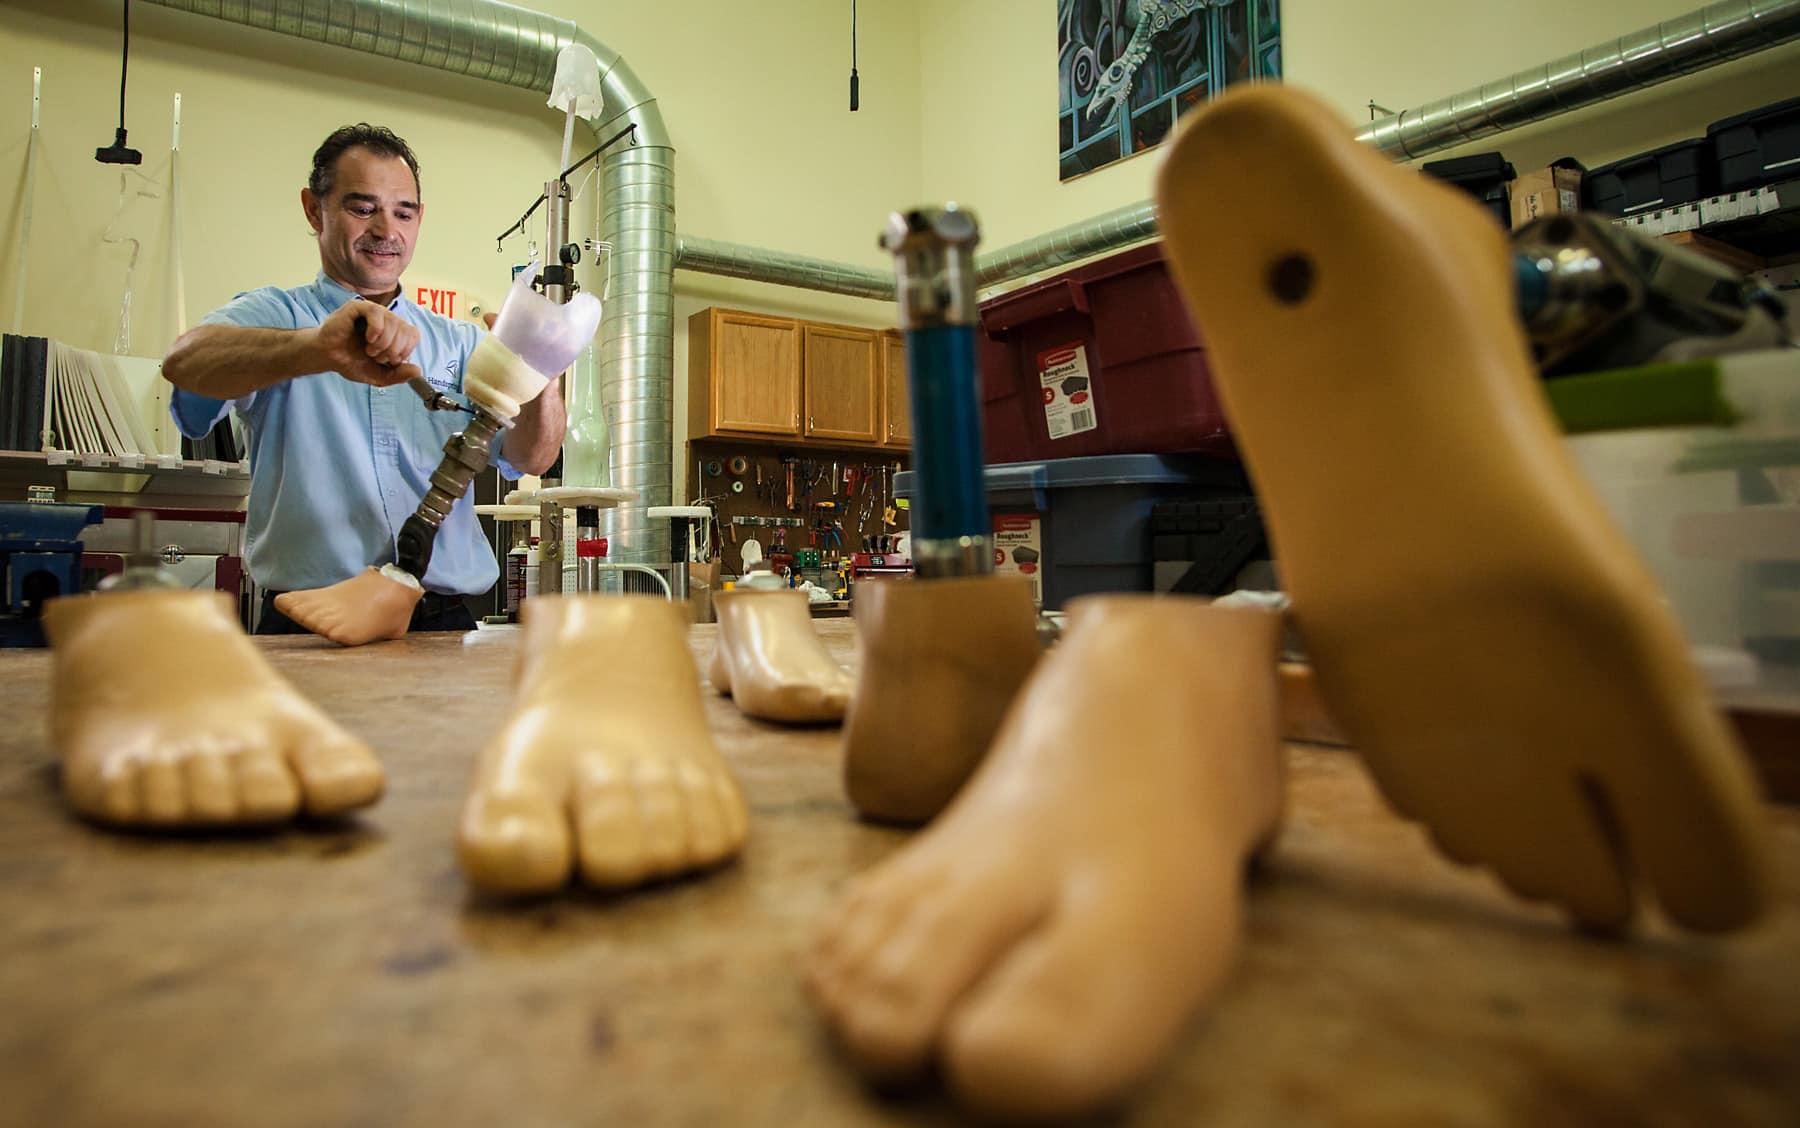 POA employee assembling prosthetics.